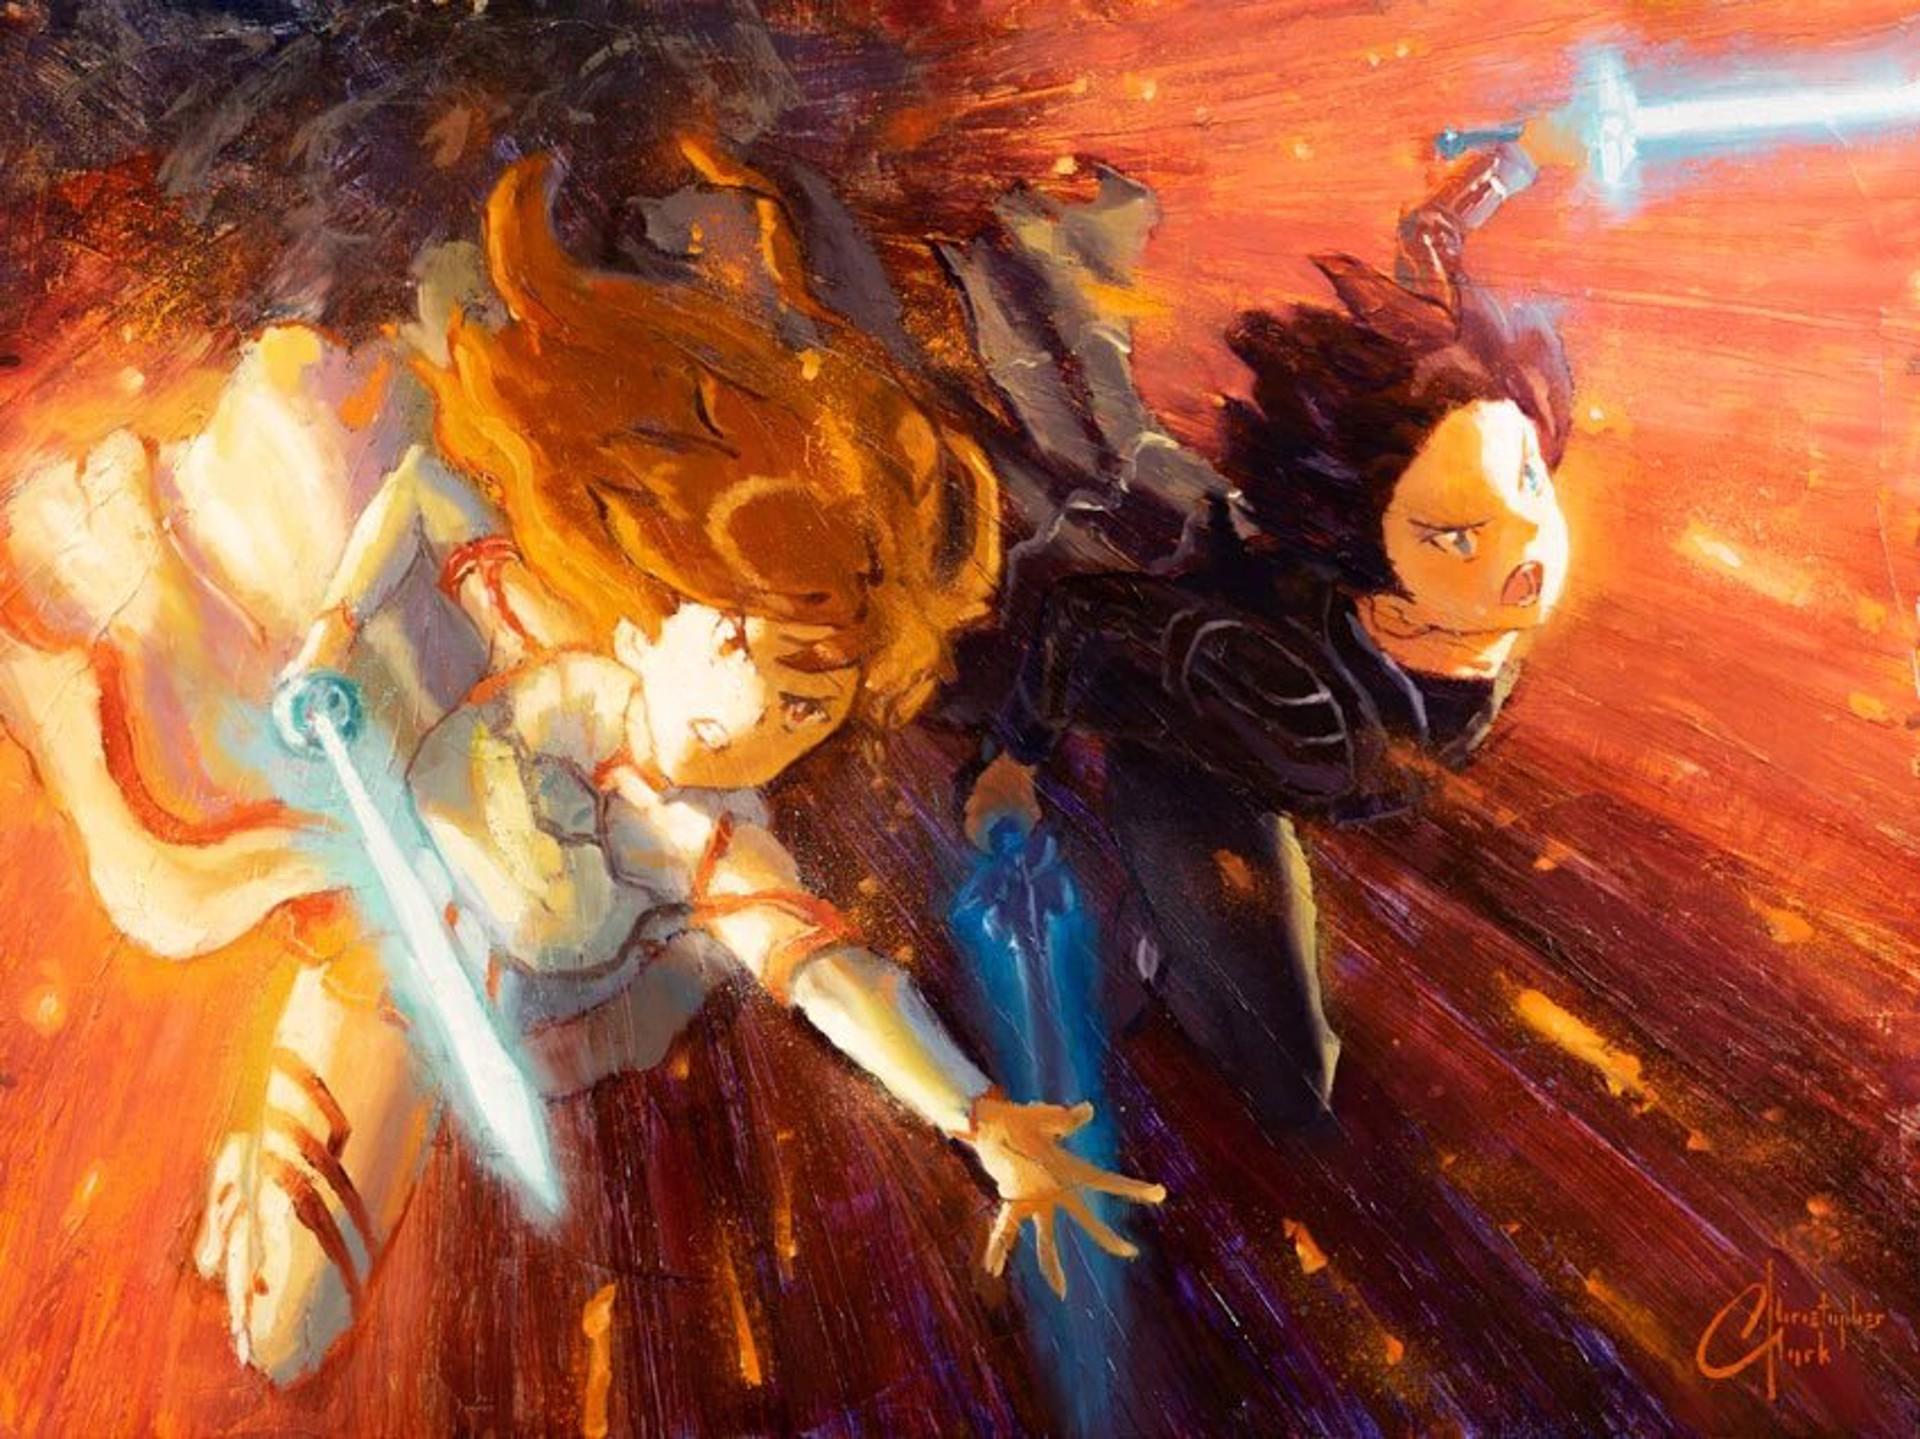 Asuna and Kirito by Christopher Clark